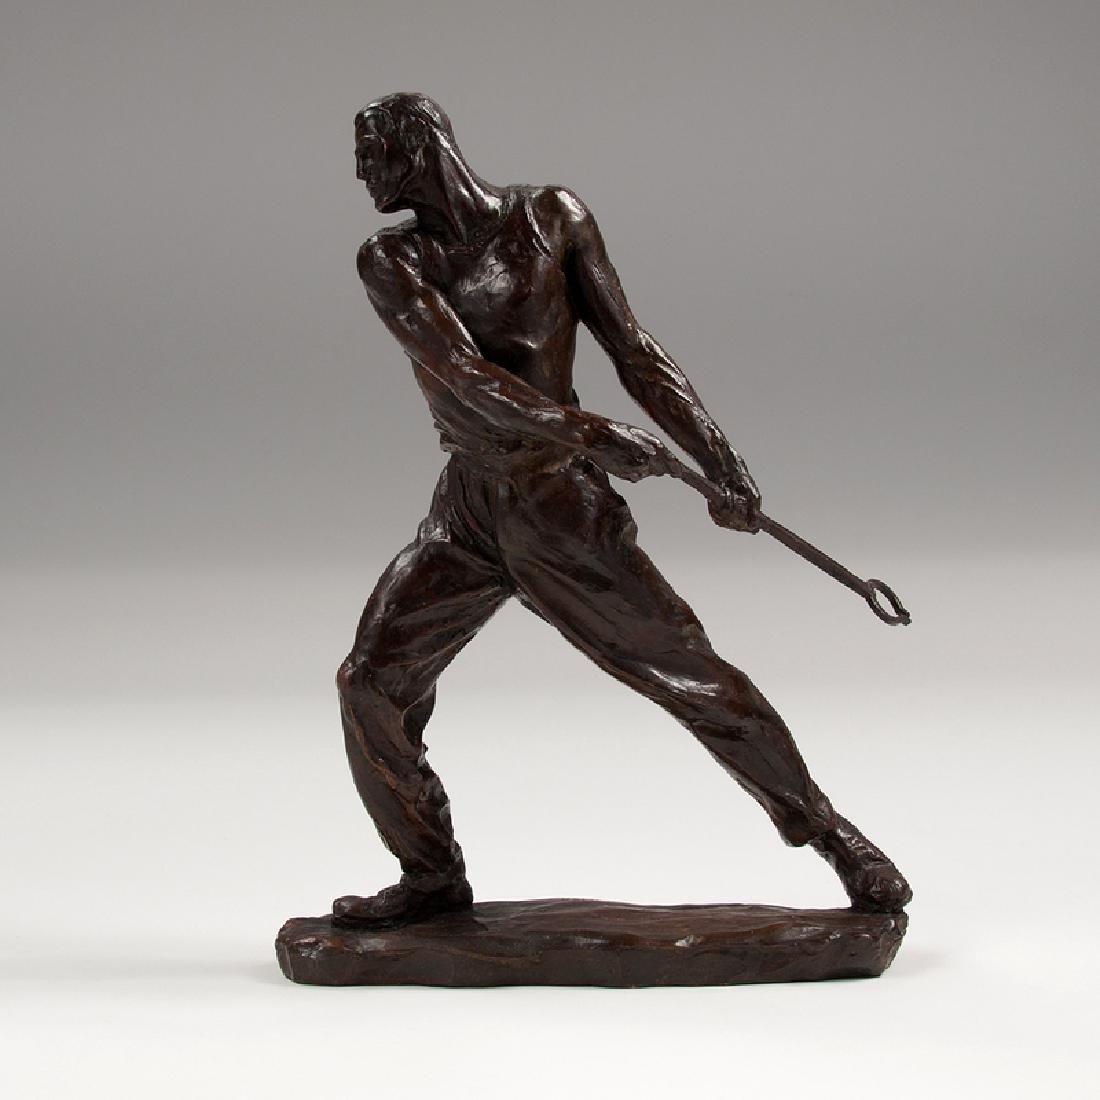 Max Kalish (American, 1891-1945) Bronze